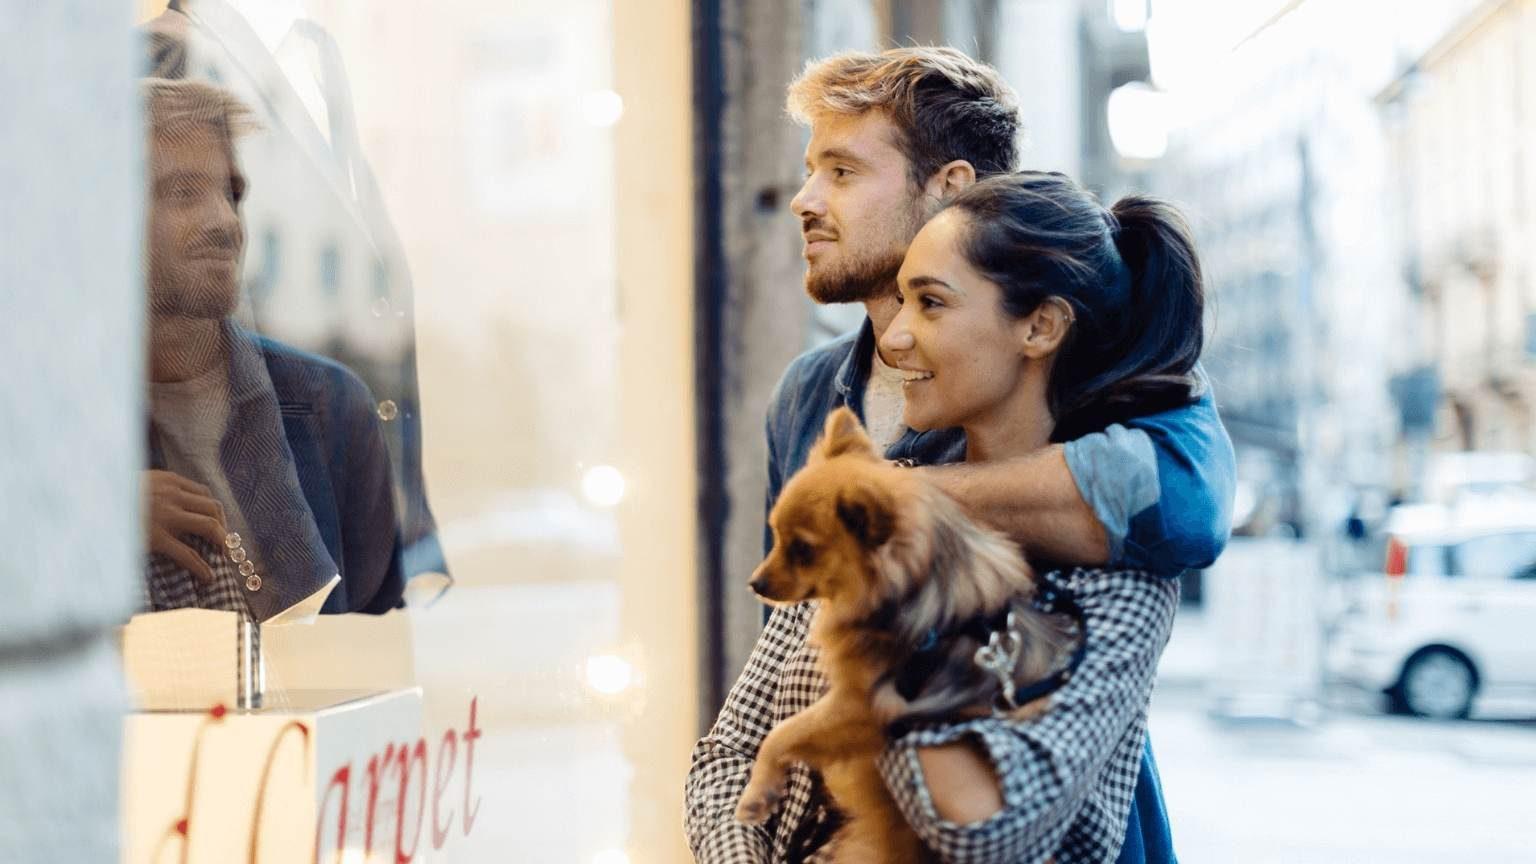 Couple holding a dog